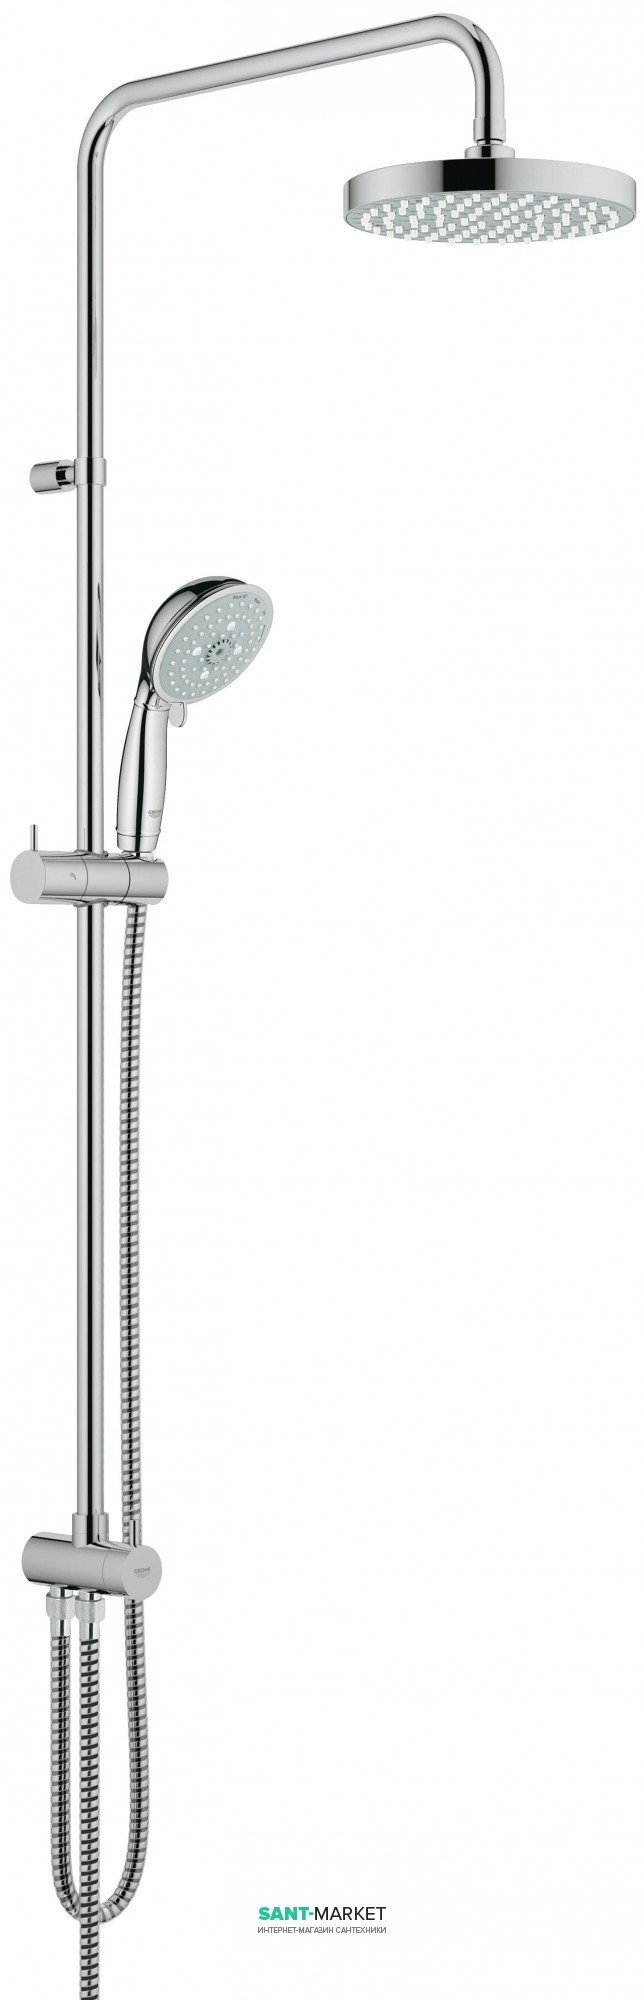 Grohe BauClassic Душевая система с верхним ручным душем 27399000